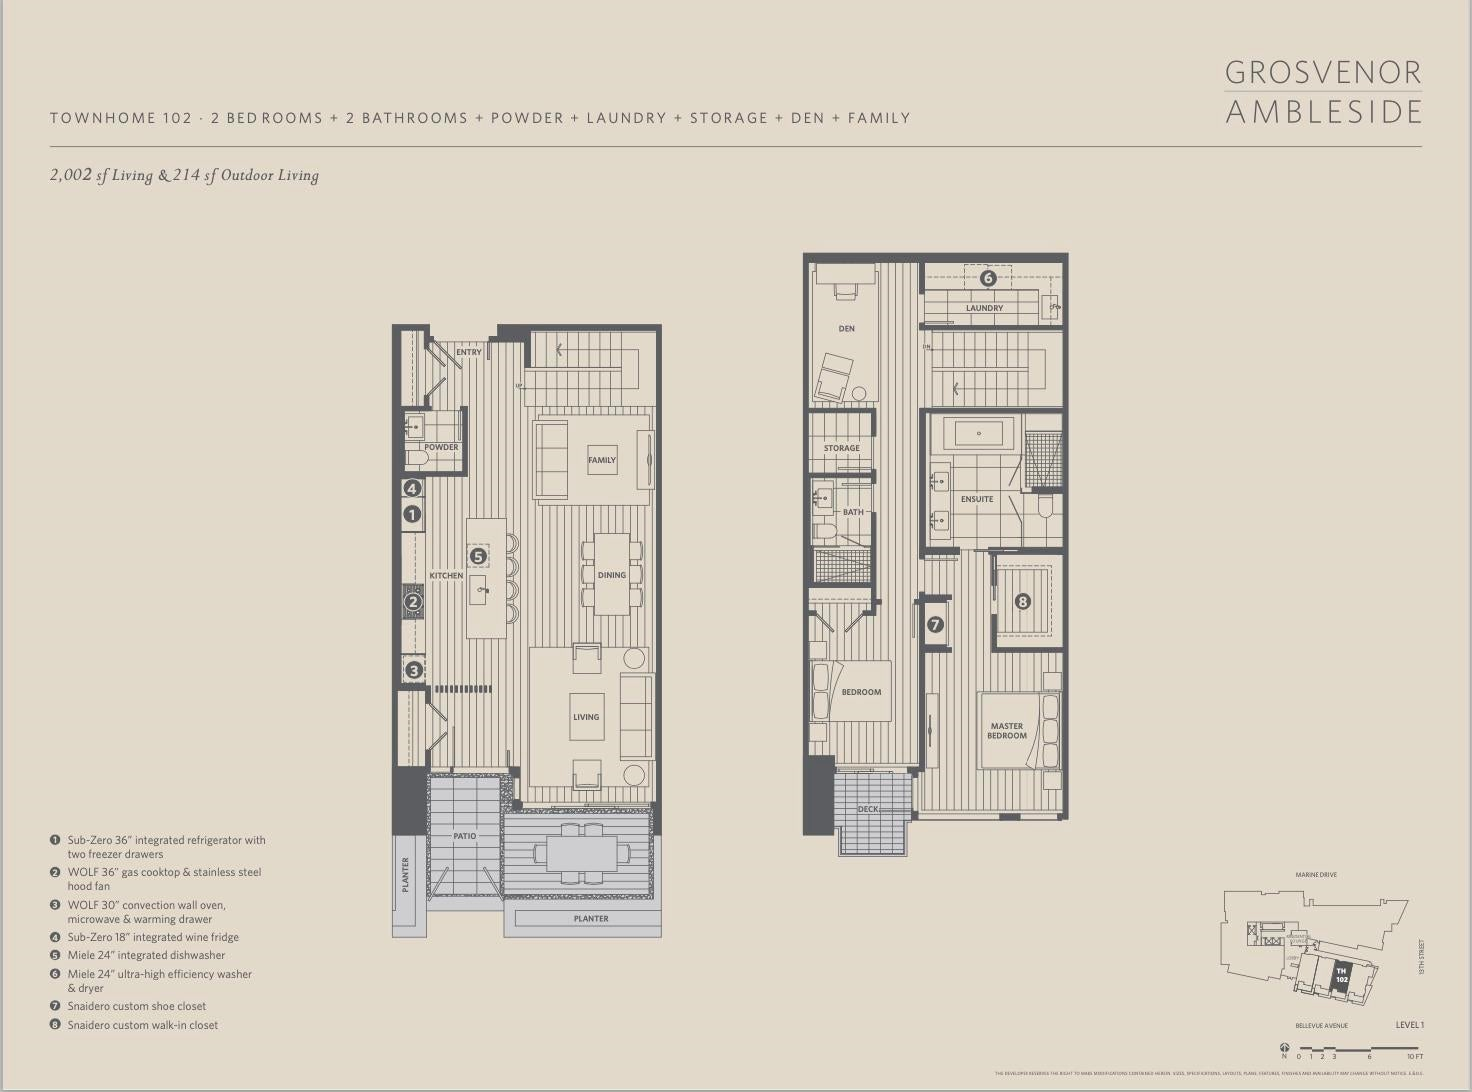 TH102 1327 BELLEVUE AVENUE - Ambleside Townhouse for sale, 2 Bedrooms (R2596338) - #3